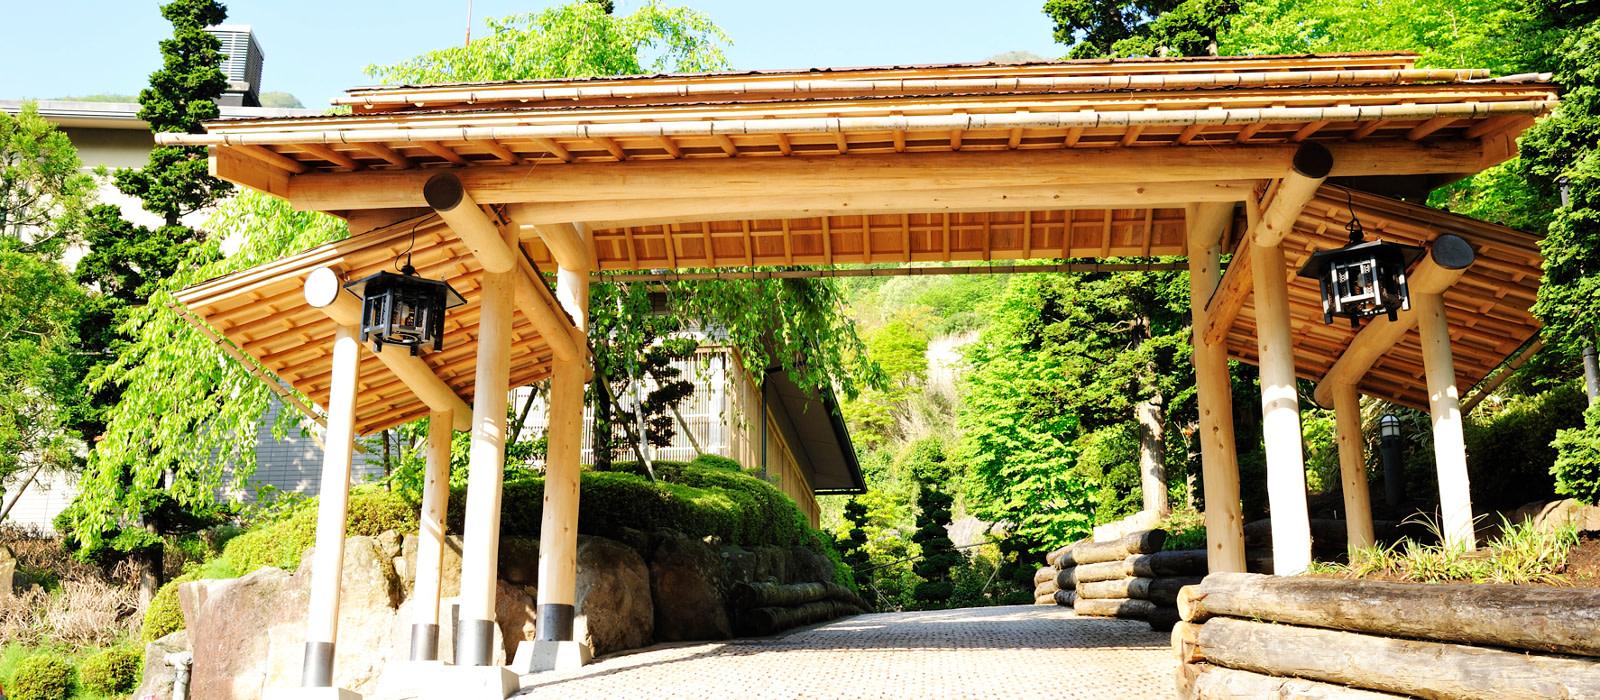 Hotel Gora Hanaougi Ryokan Japan